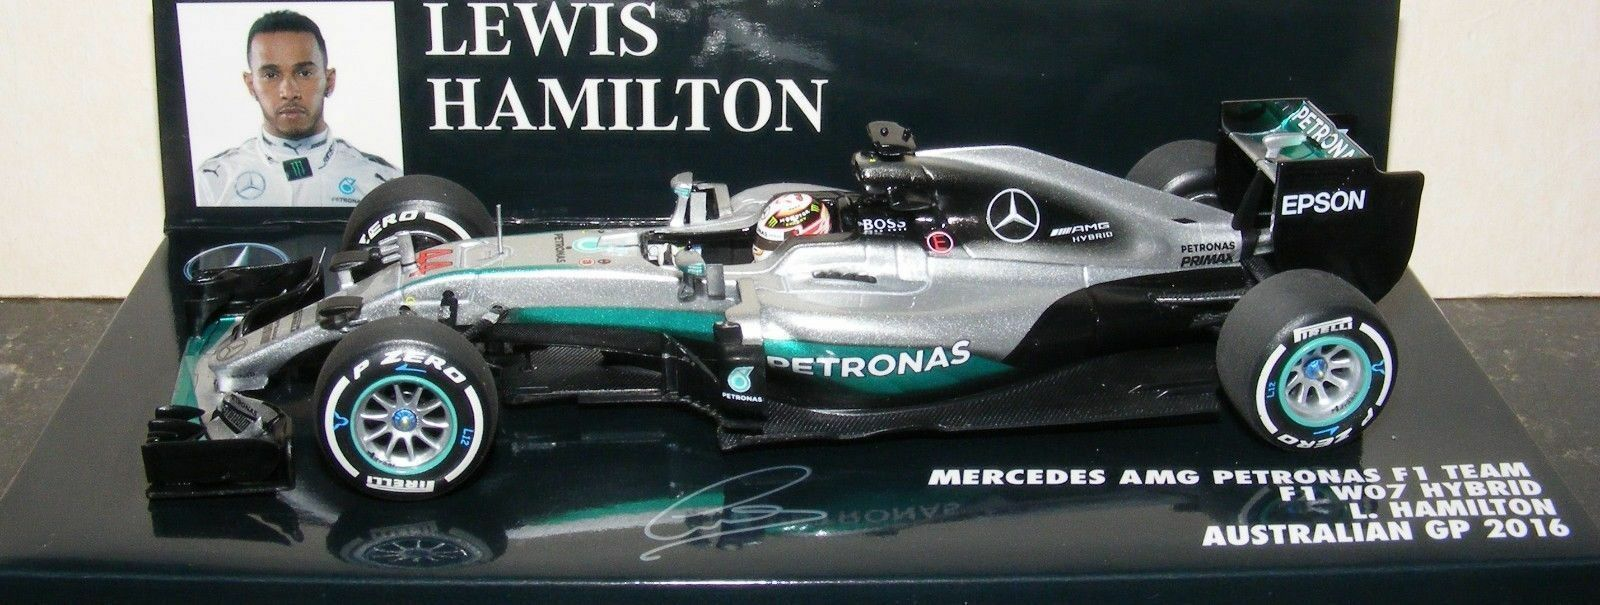 Minichamps Mercedes W07 Lewis Hamilton World Champion Team 2016 1 43 410160044